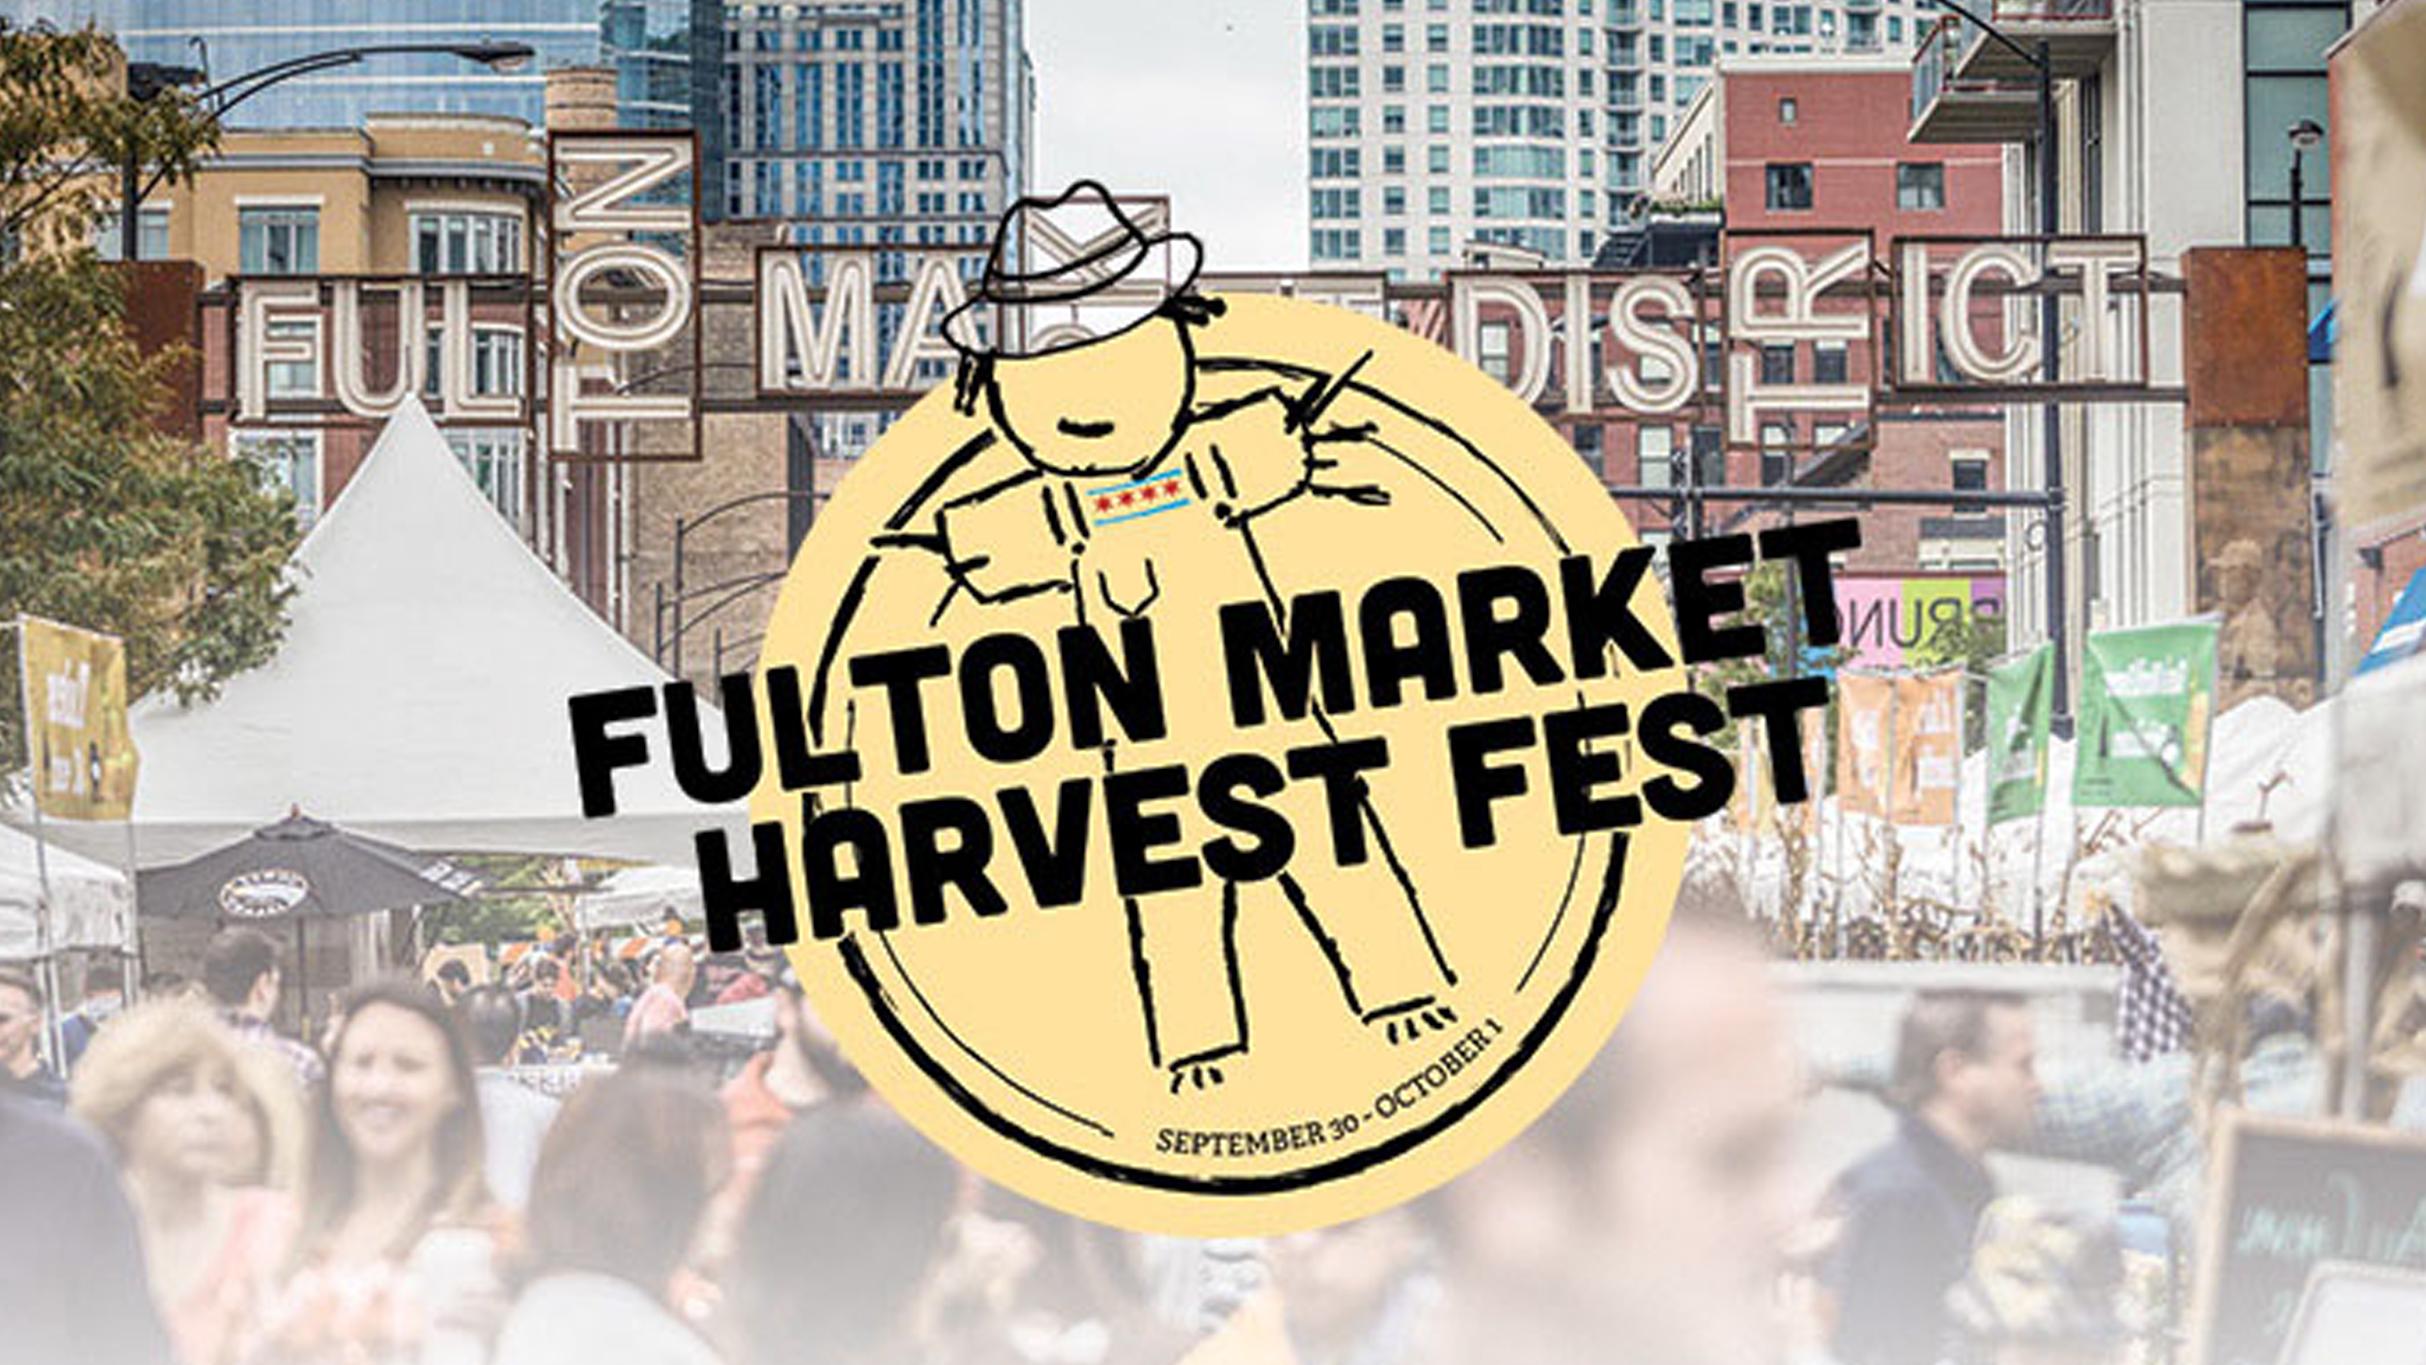 FESTIVAL WATCH | Fulton Market Harvest Fest